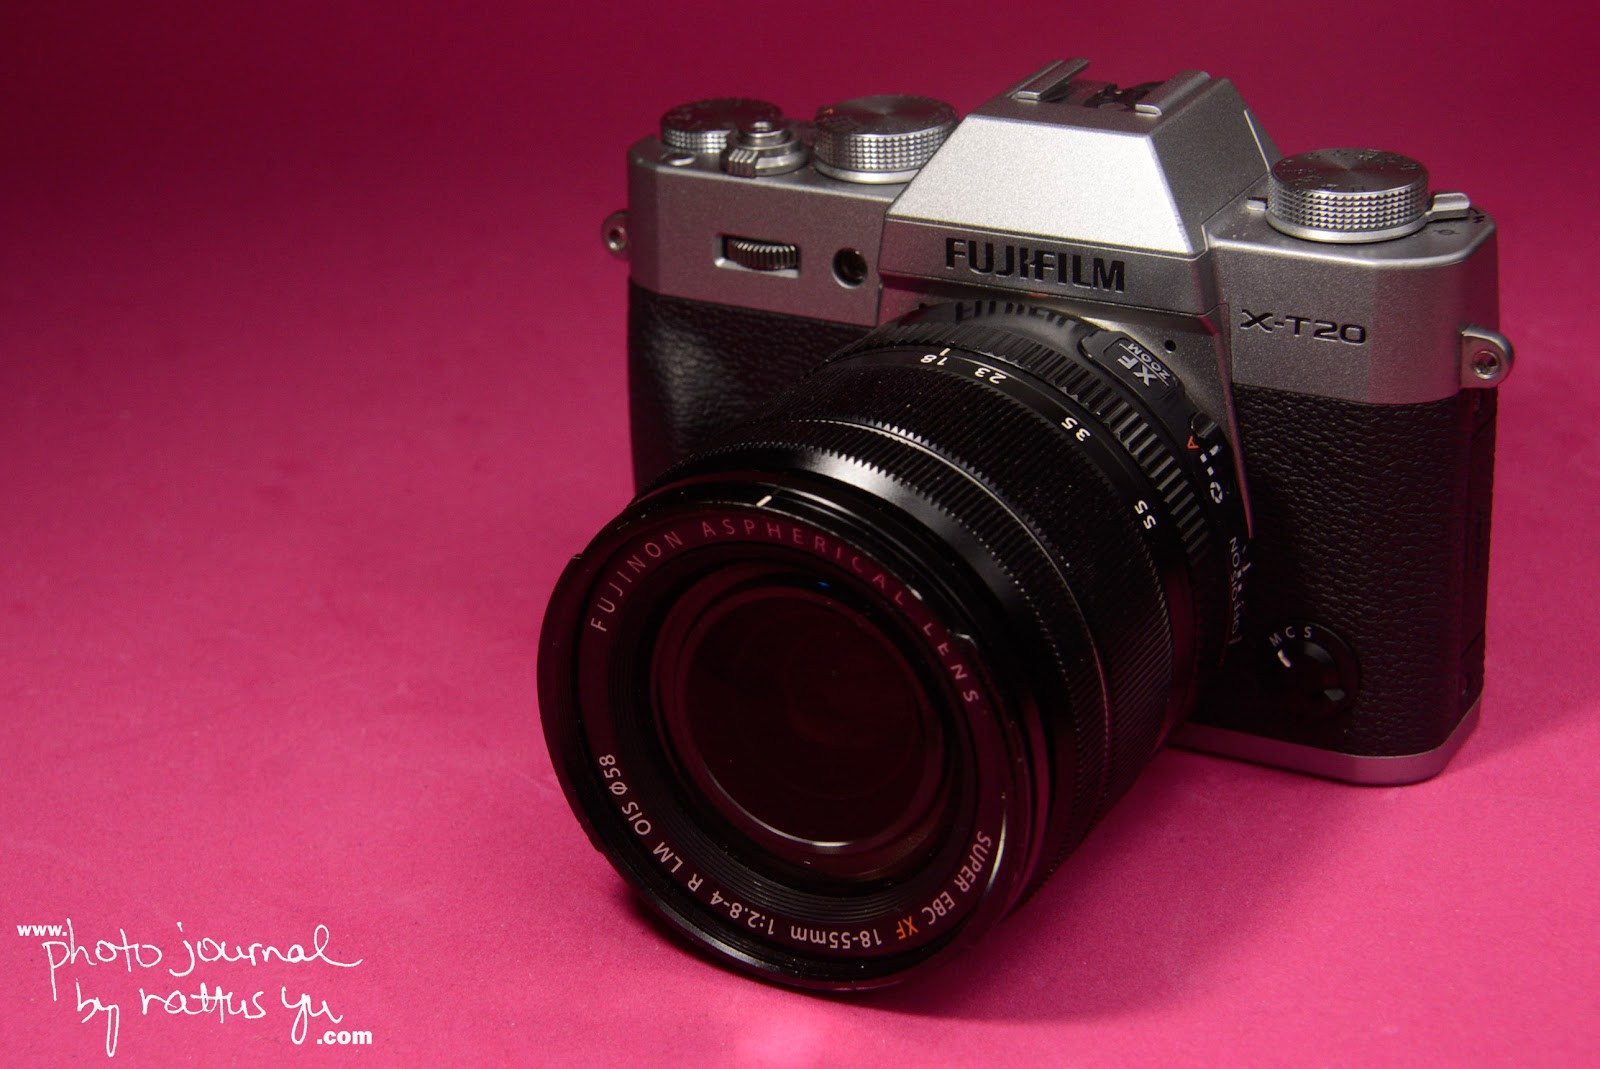 FUJINON Super EBC XF 18-55mm f/2.8-4 R LM OIS